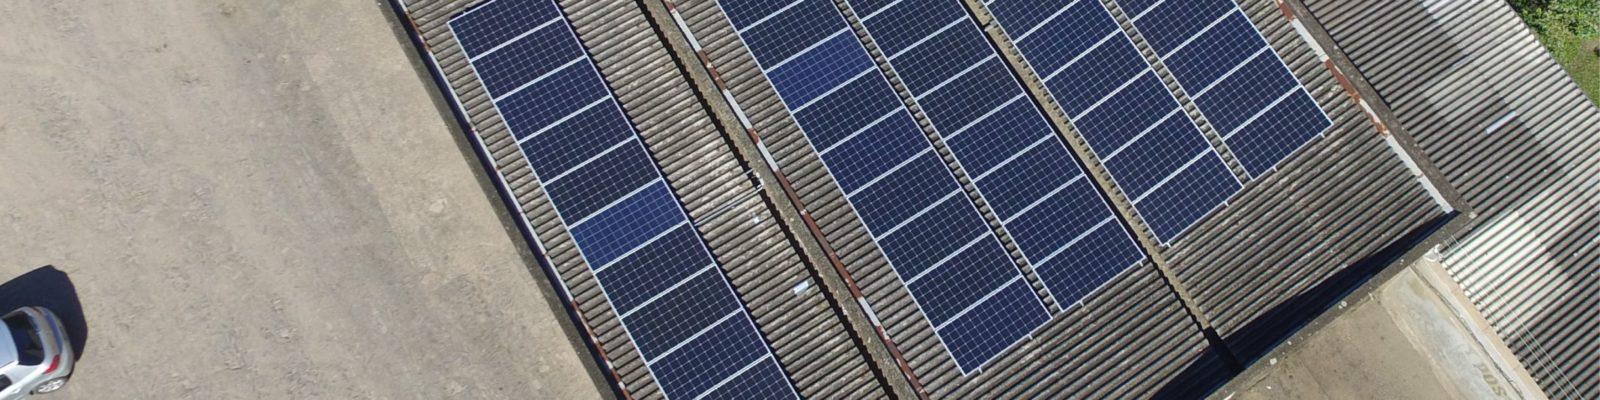 Sistema fotovoltaico comercial no RS - Elysia energia solar Osório